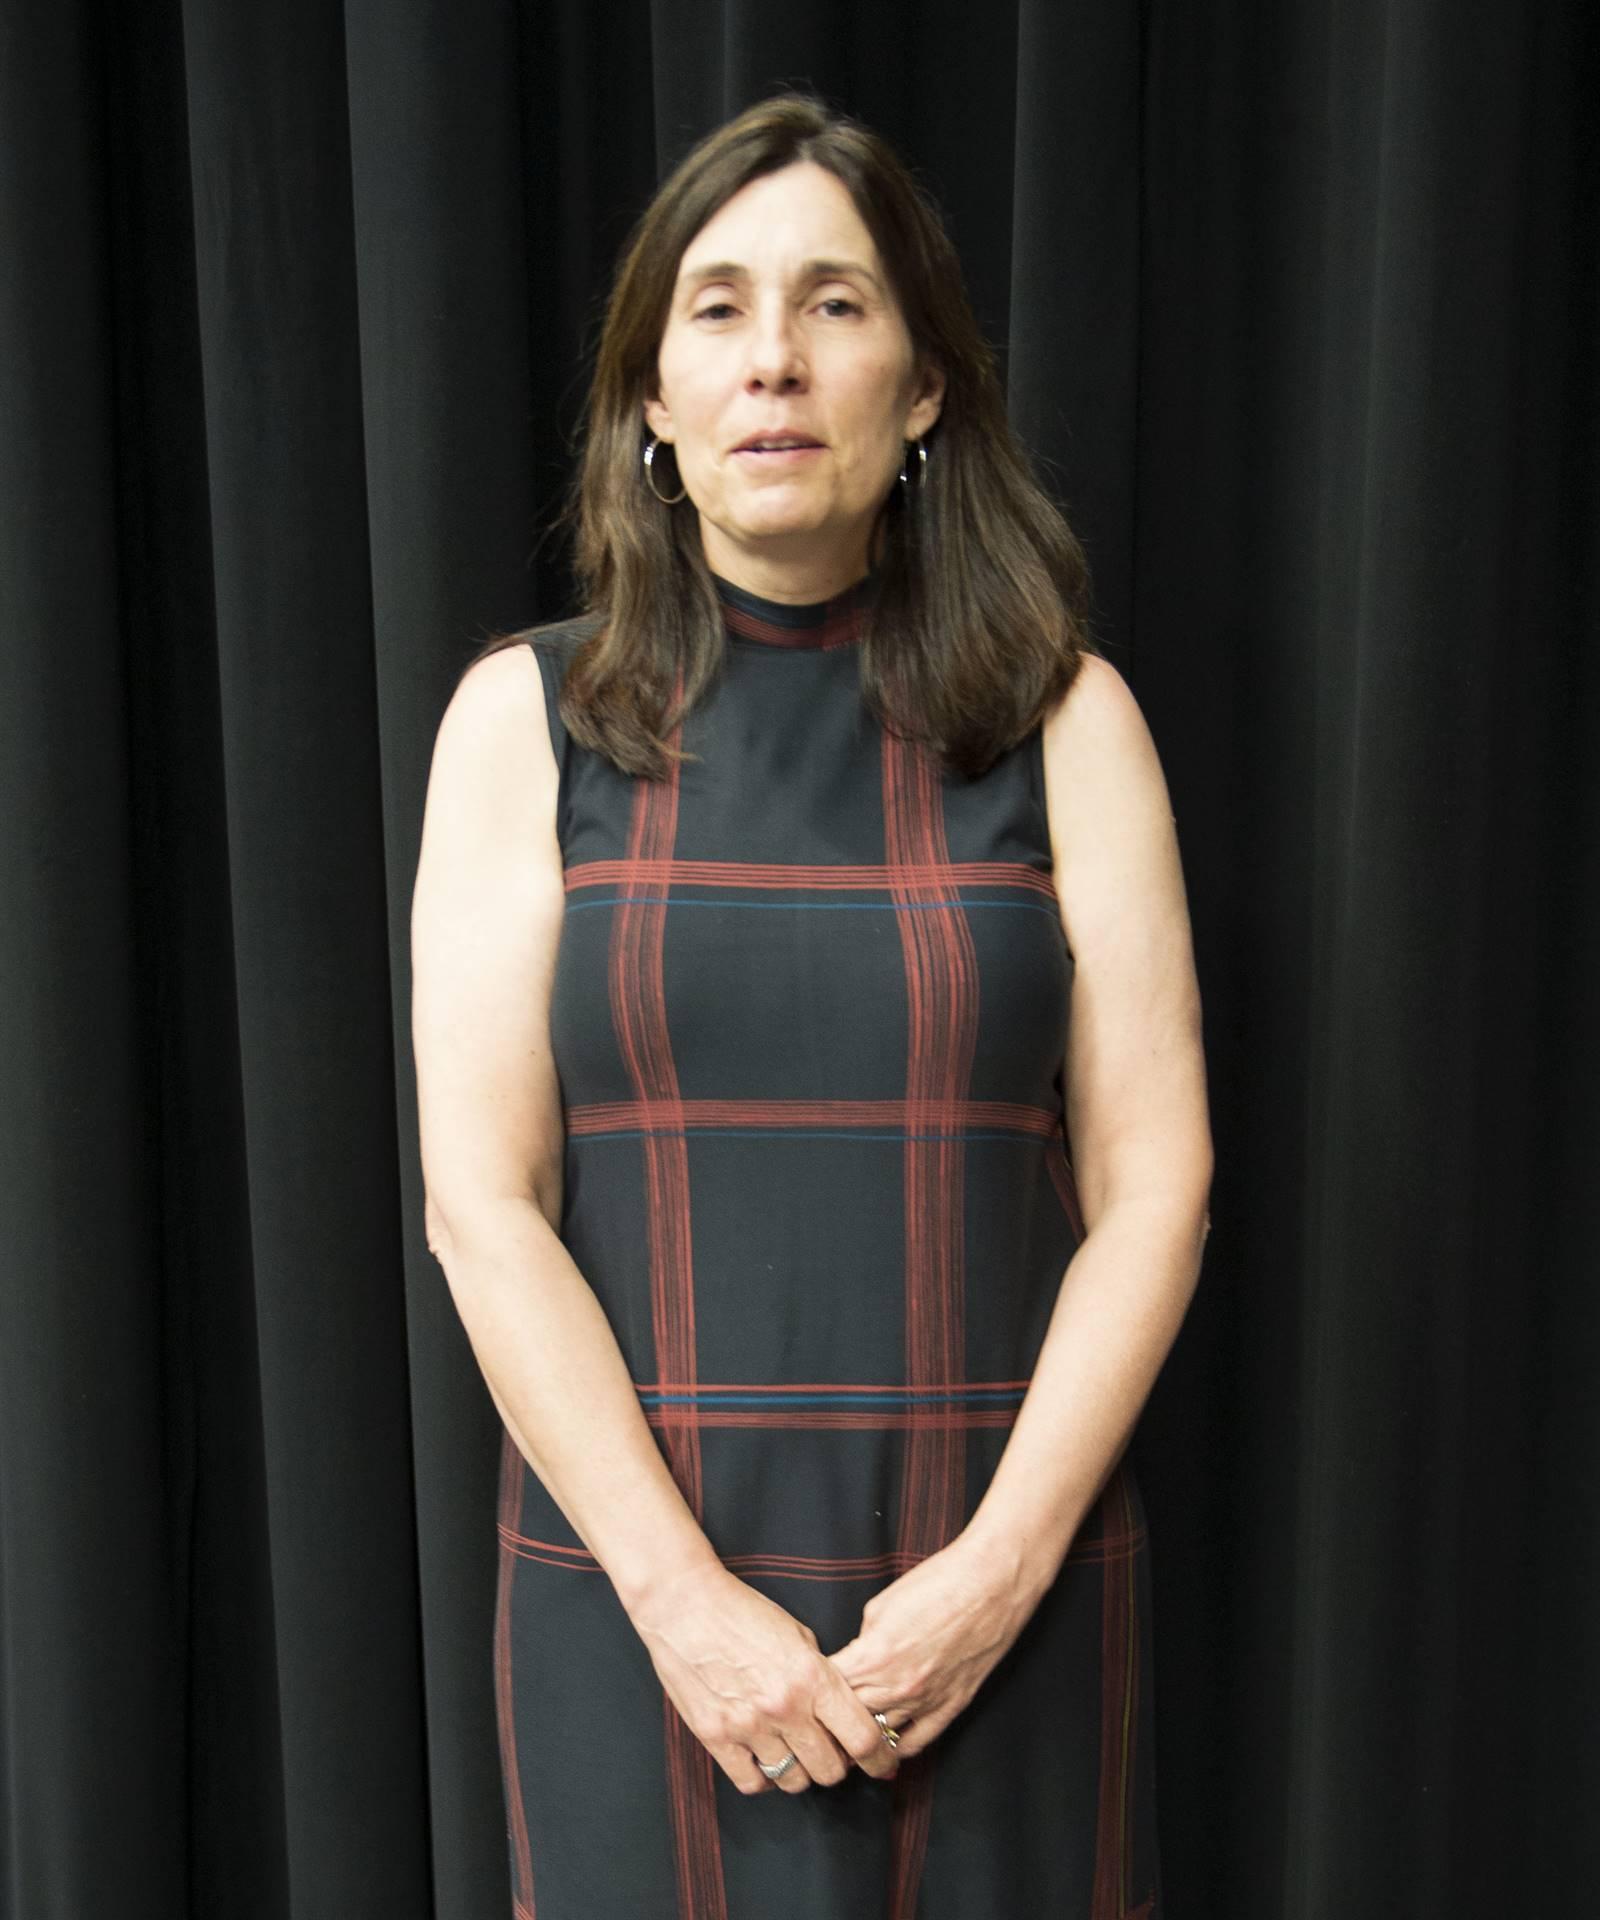 Mrs. Debbie Engelman, Business Administrator - dengelman@quipsd.org